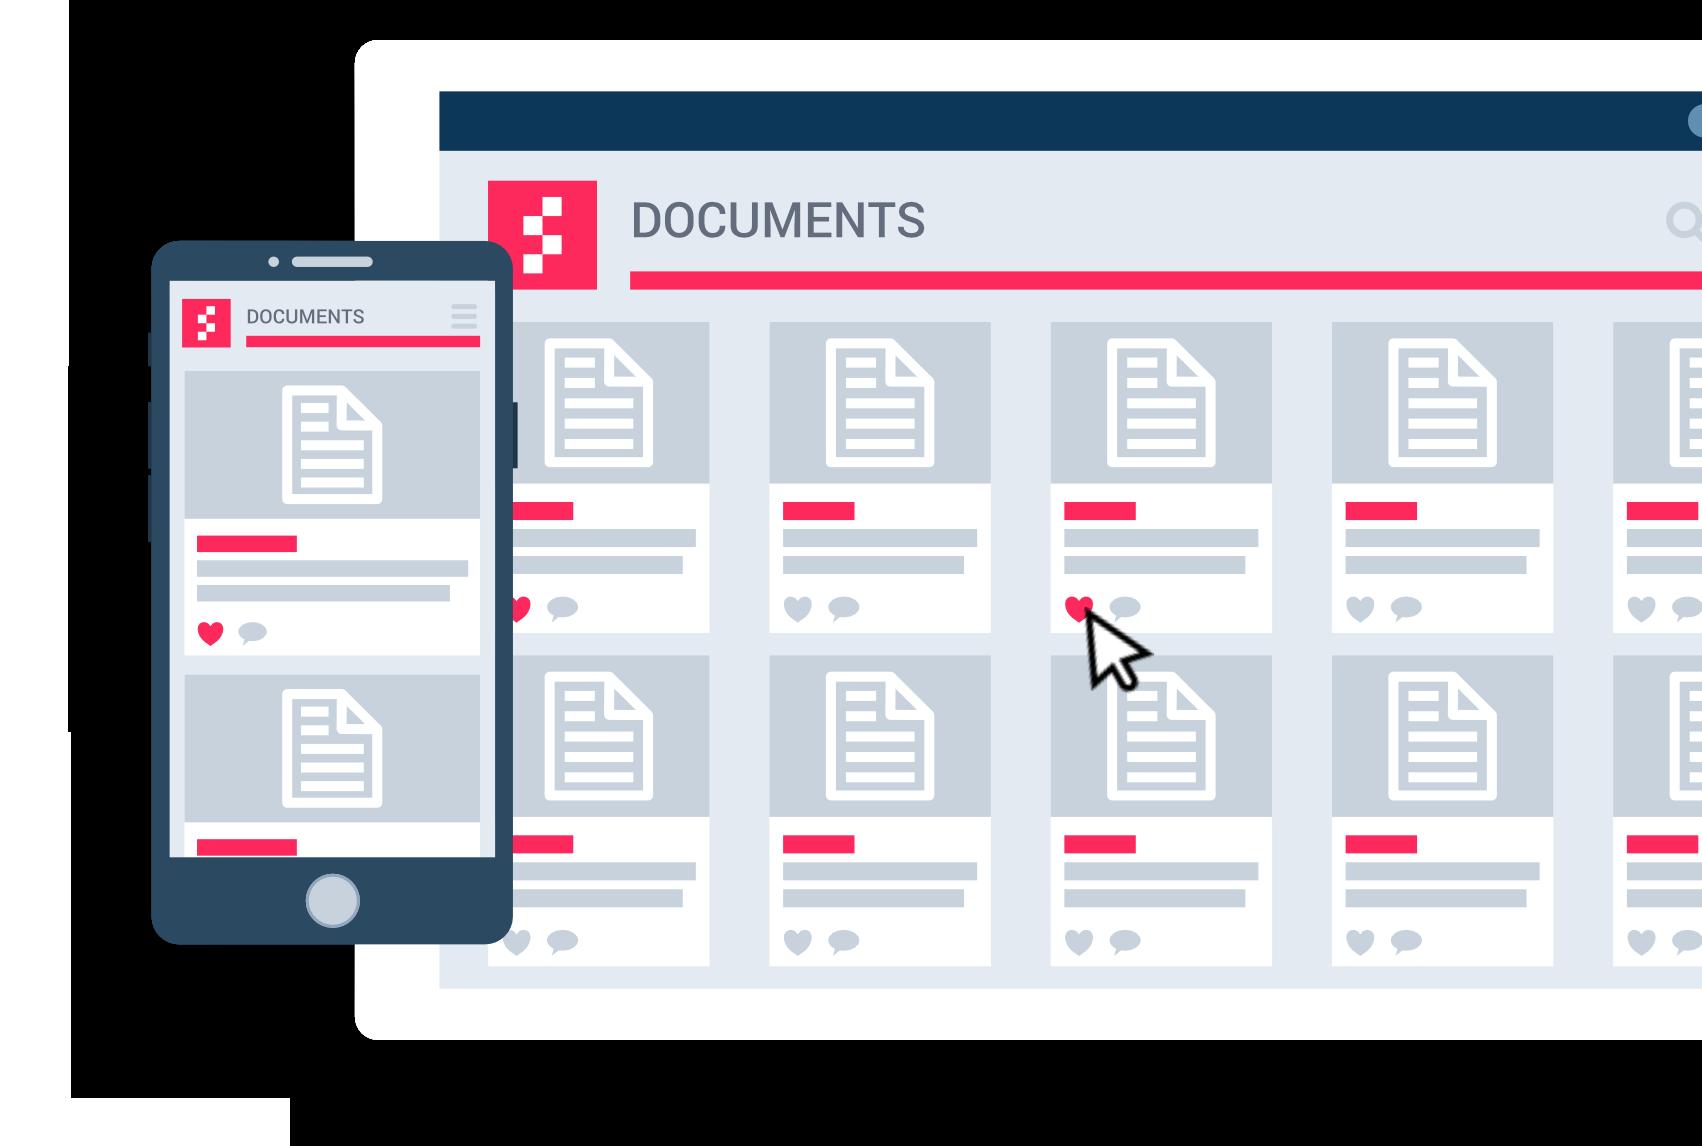 ClusterWall - Documentos